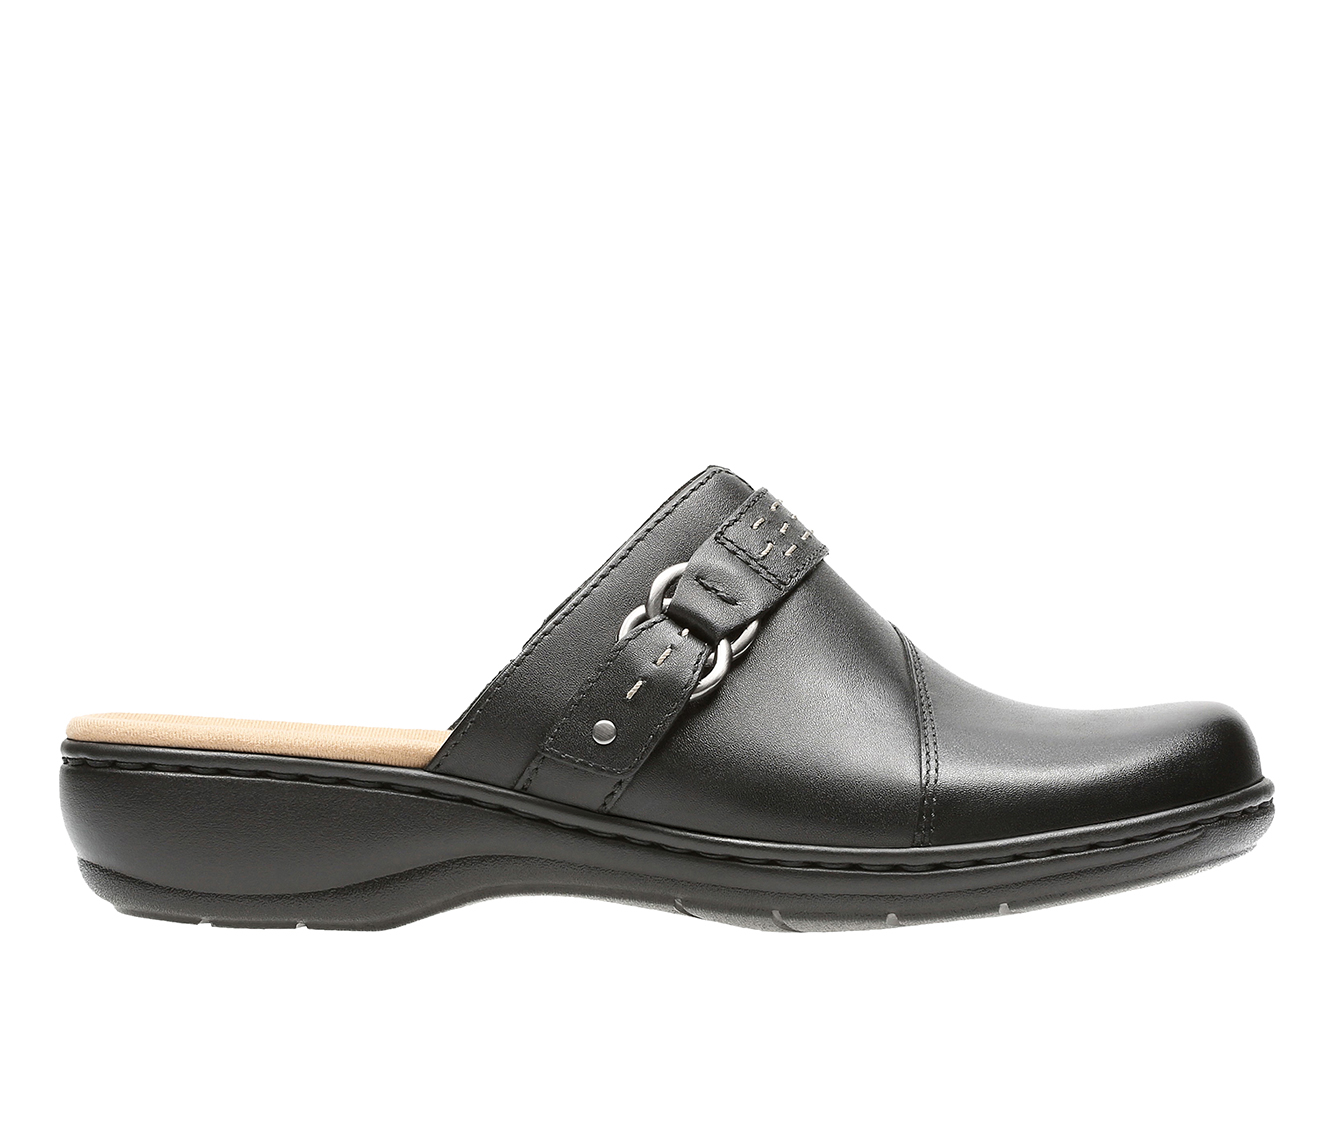 Clarks Leisa Sadie Women's Shoe (Black Leather)